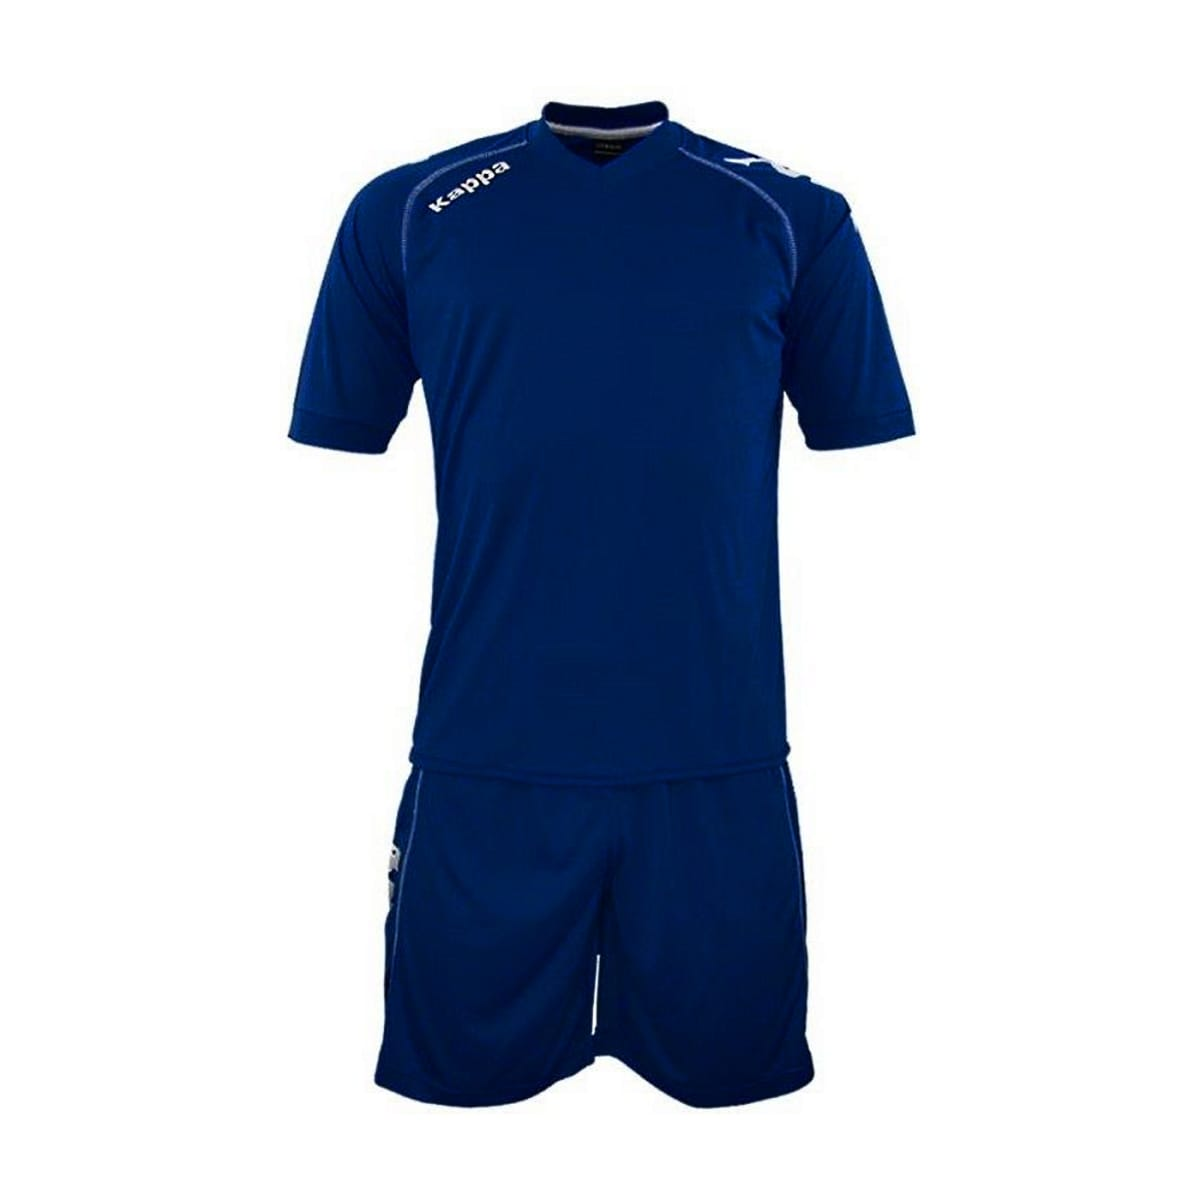 2f19a7ae359 Soccer